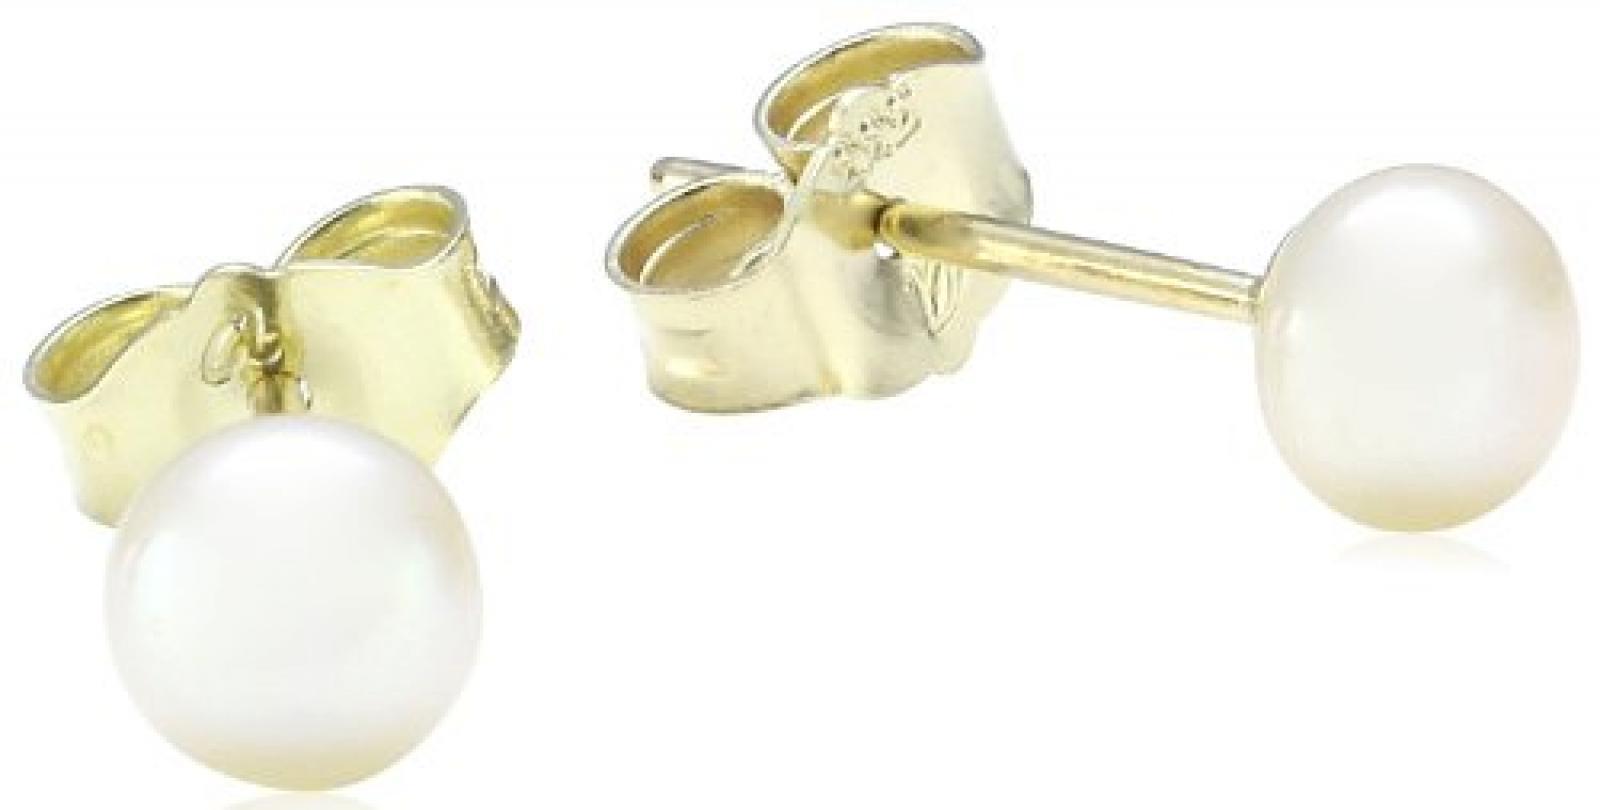 Amor Jewelry Damen-Ohrstecker 8 Karat 333 Gelbgold 84307